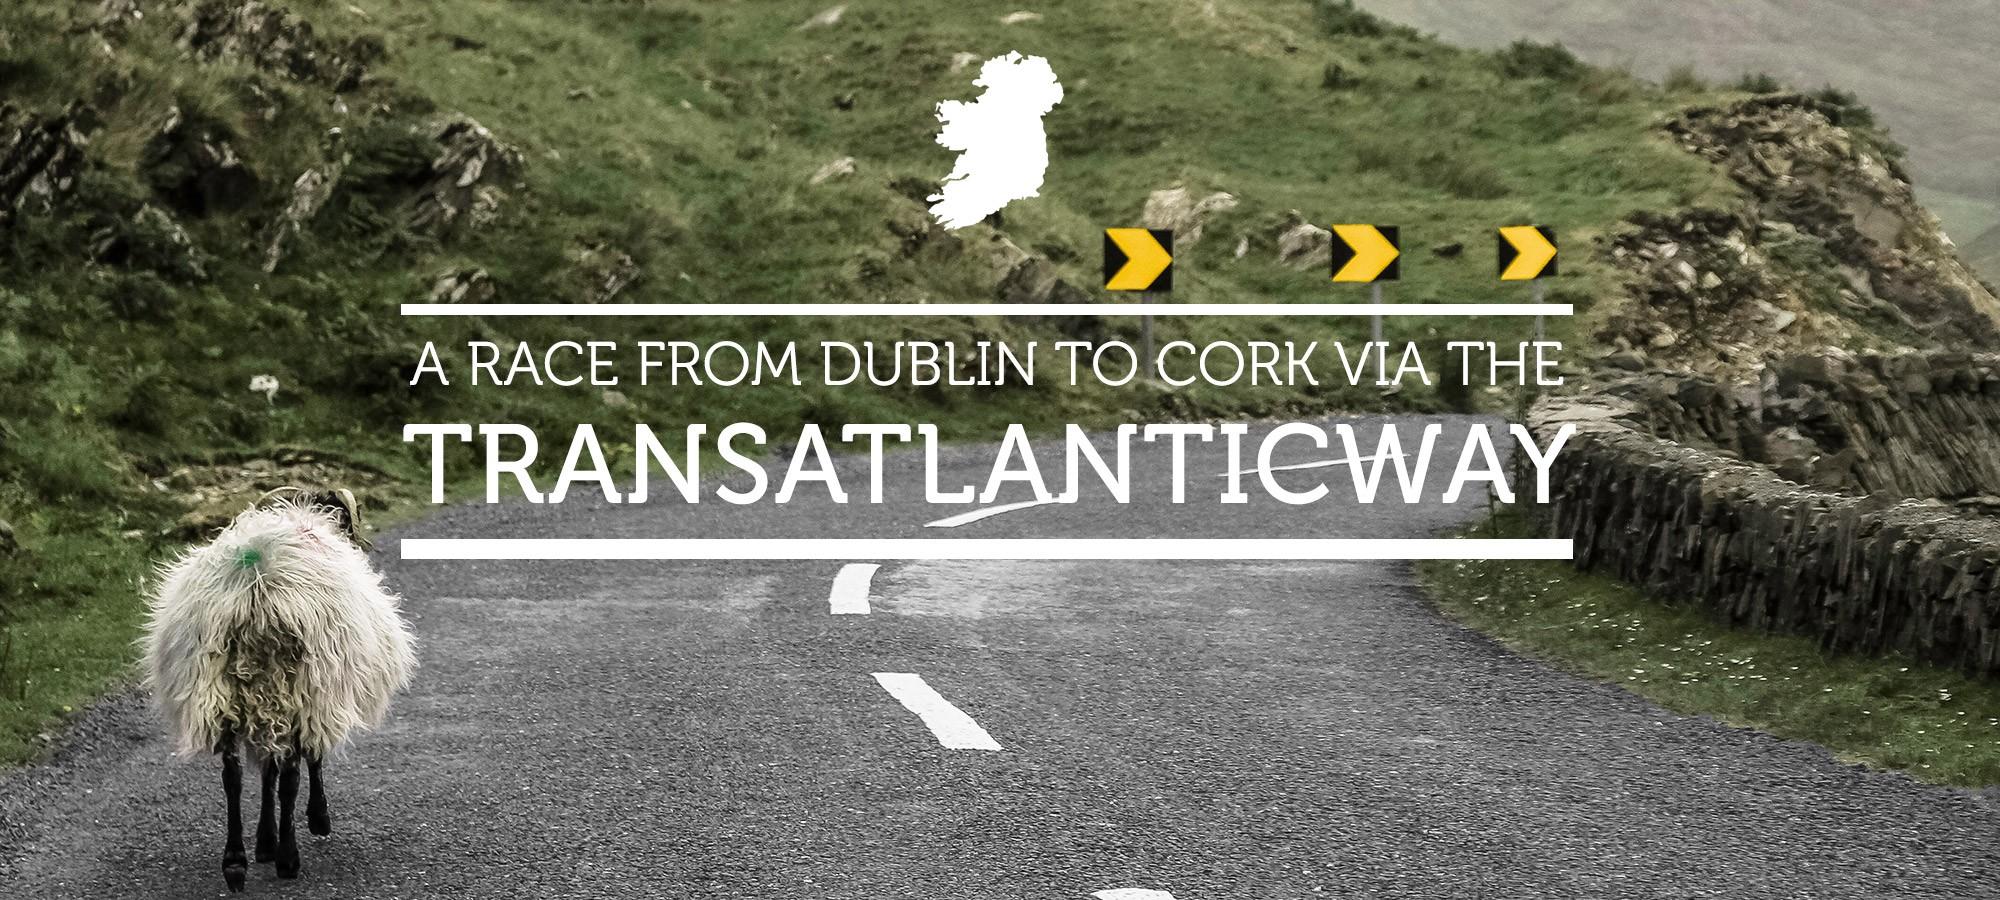 startimage-irland